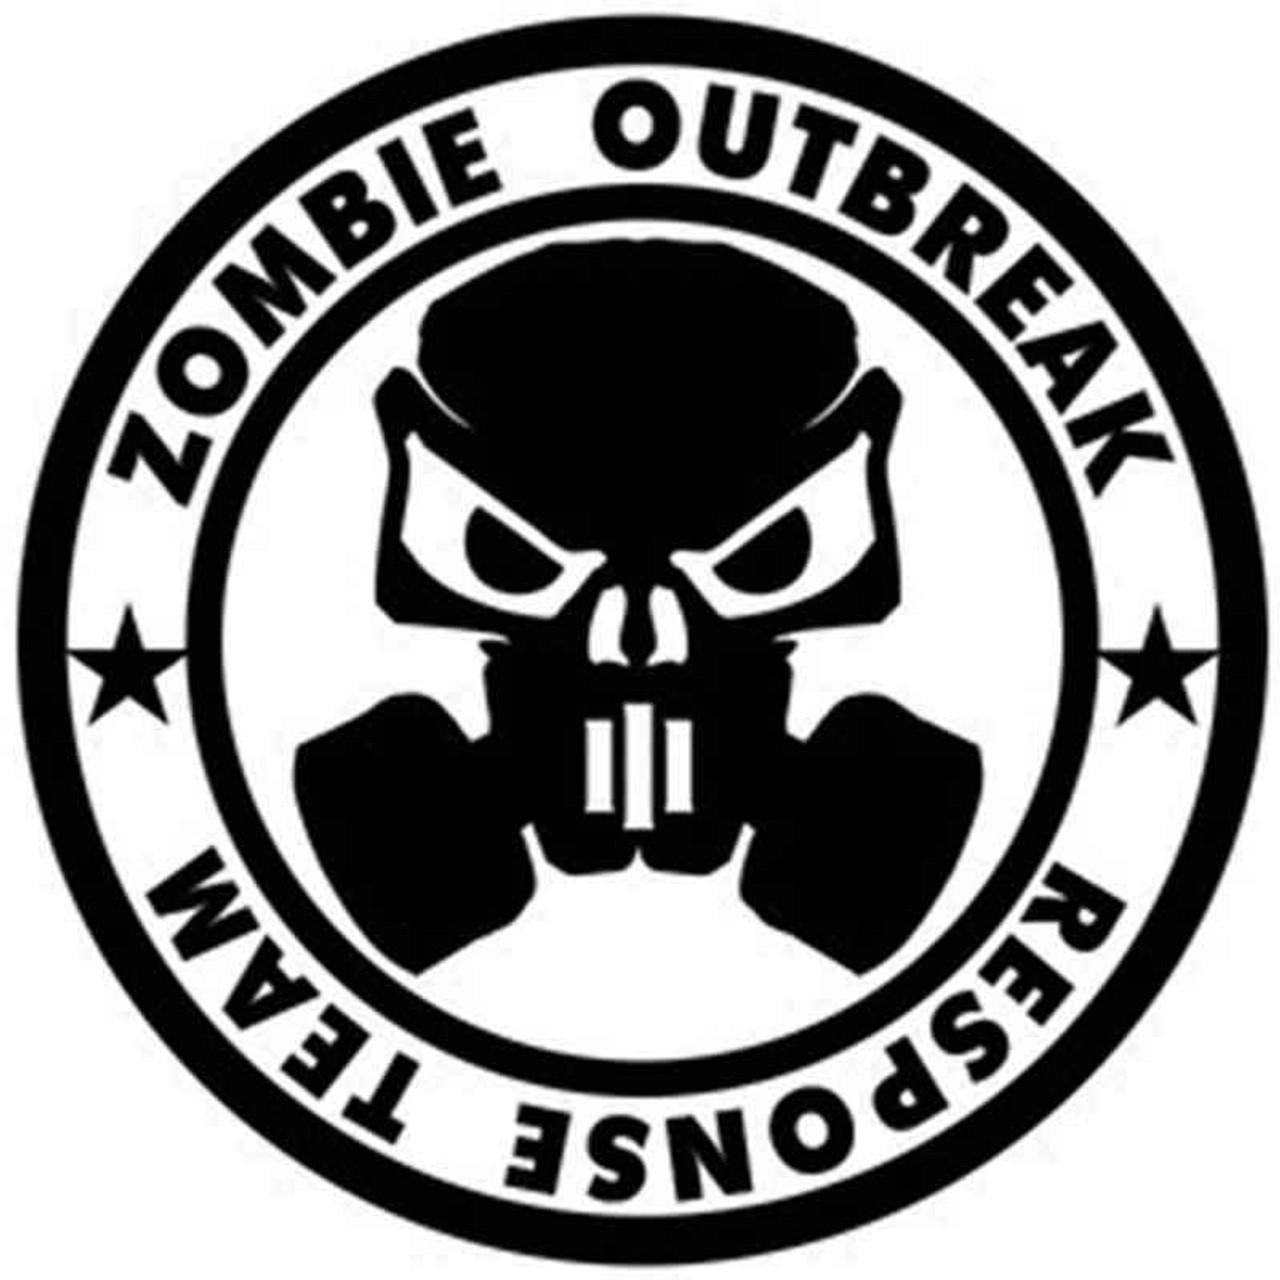 zombie outbreak 1053 vinyl sticker Zombie Radiation